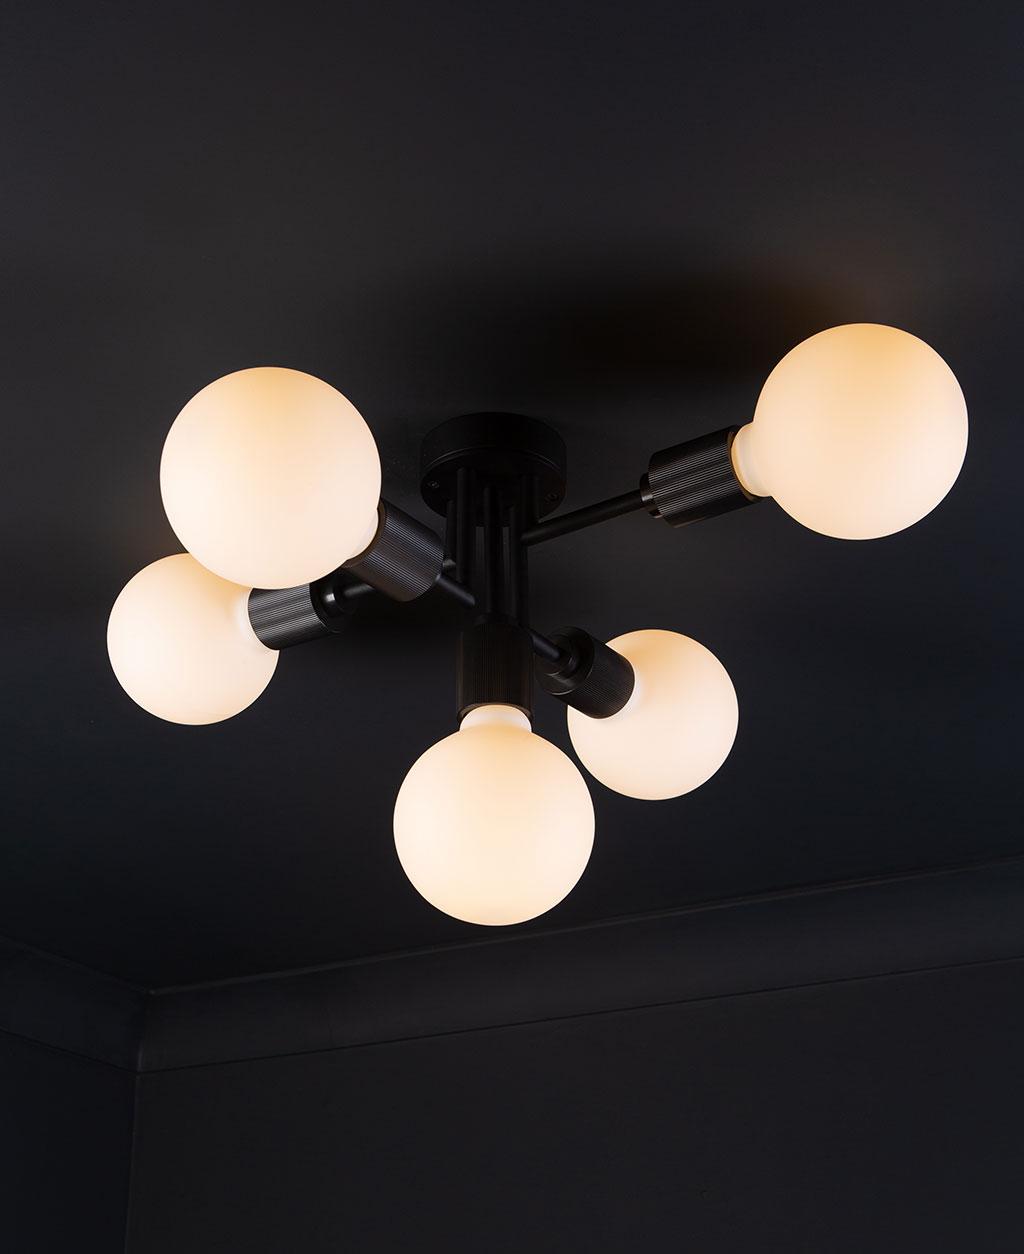 connaught flush ceiling light black ceiling light with 5 bulbs on black ceiling.